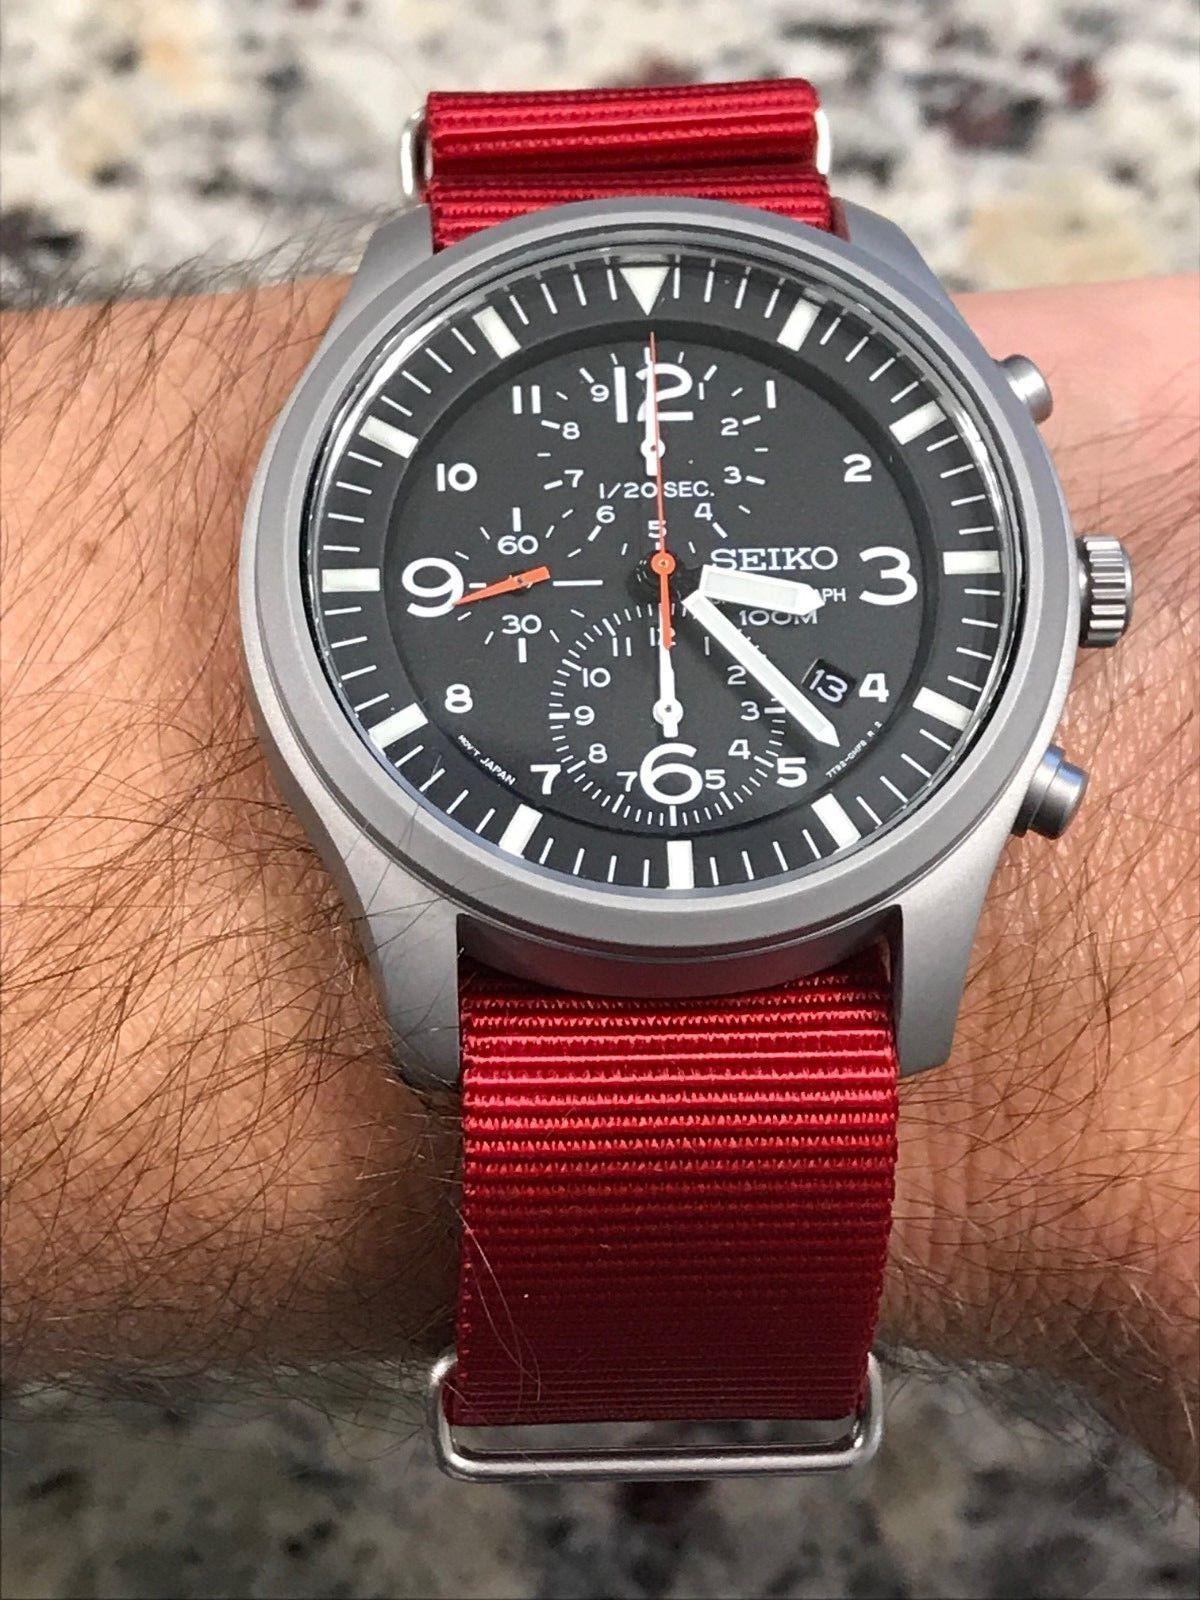 Seiko SNDA57P1 Quartz Chronograph Field Watch with added BluShark NATO Strap 229a9cf602